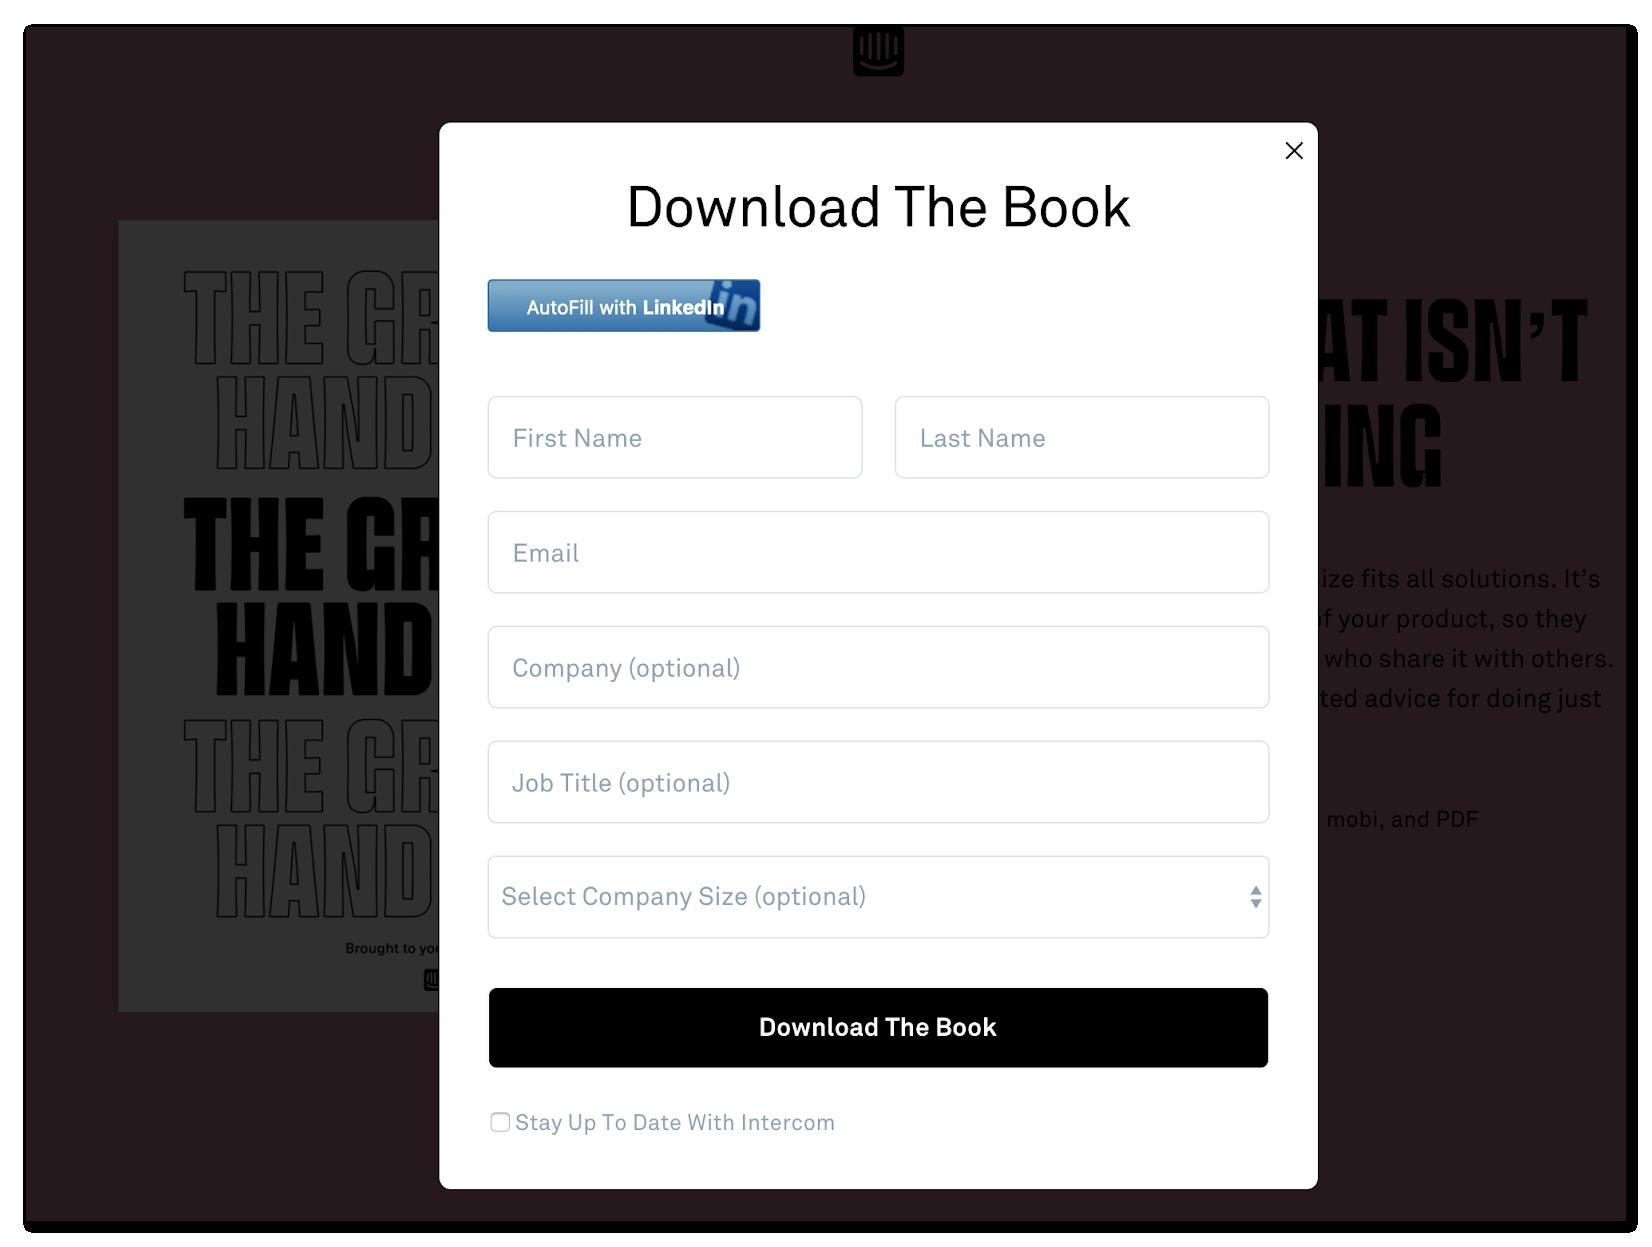 Download an e-book - inbound marketing